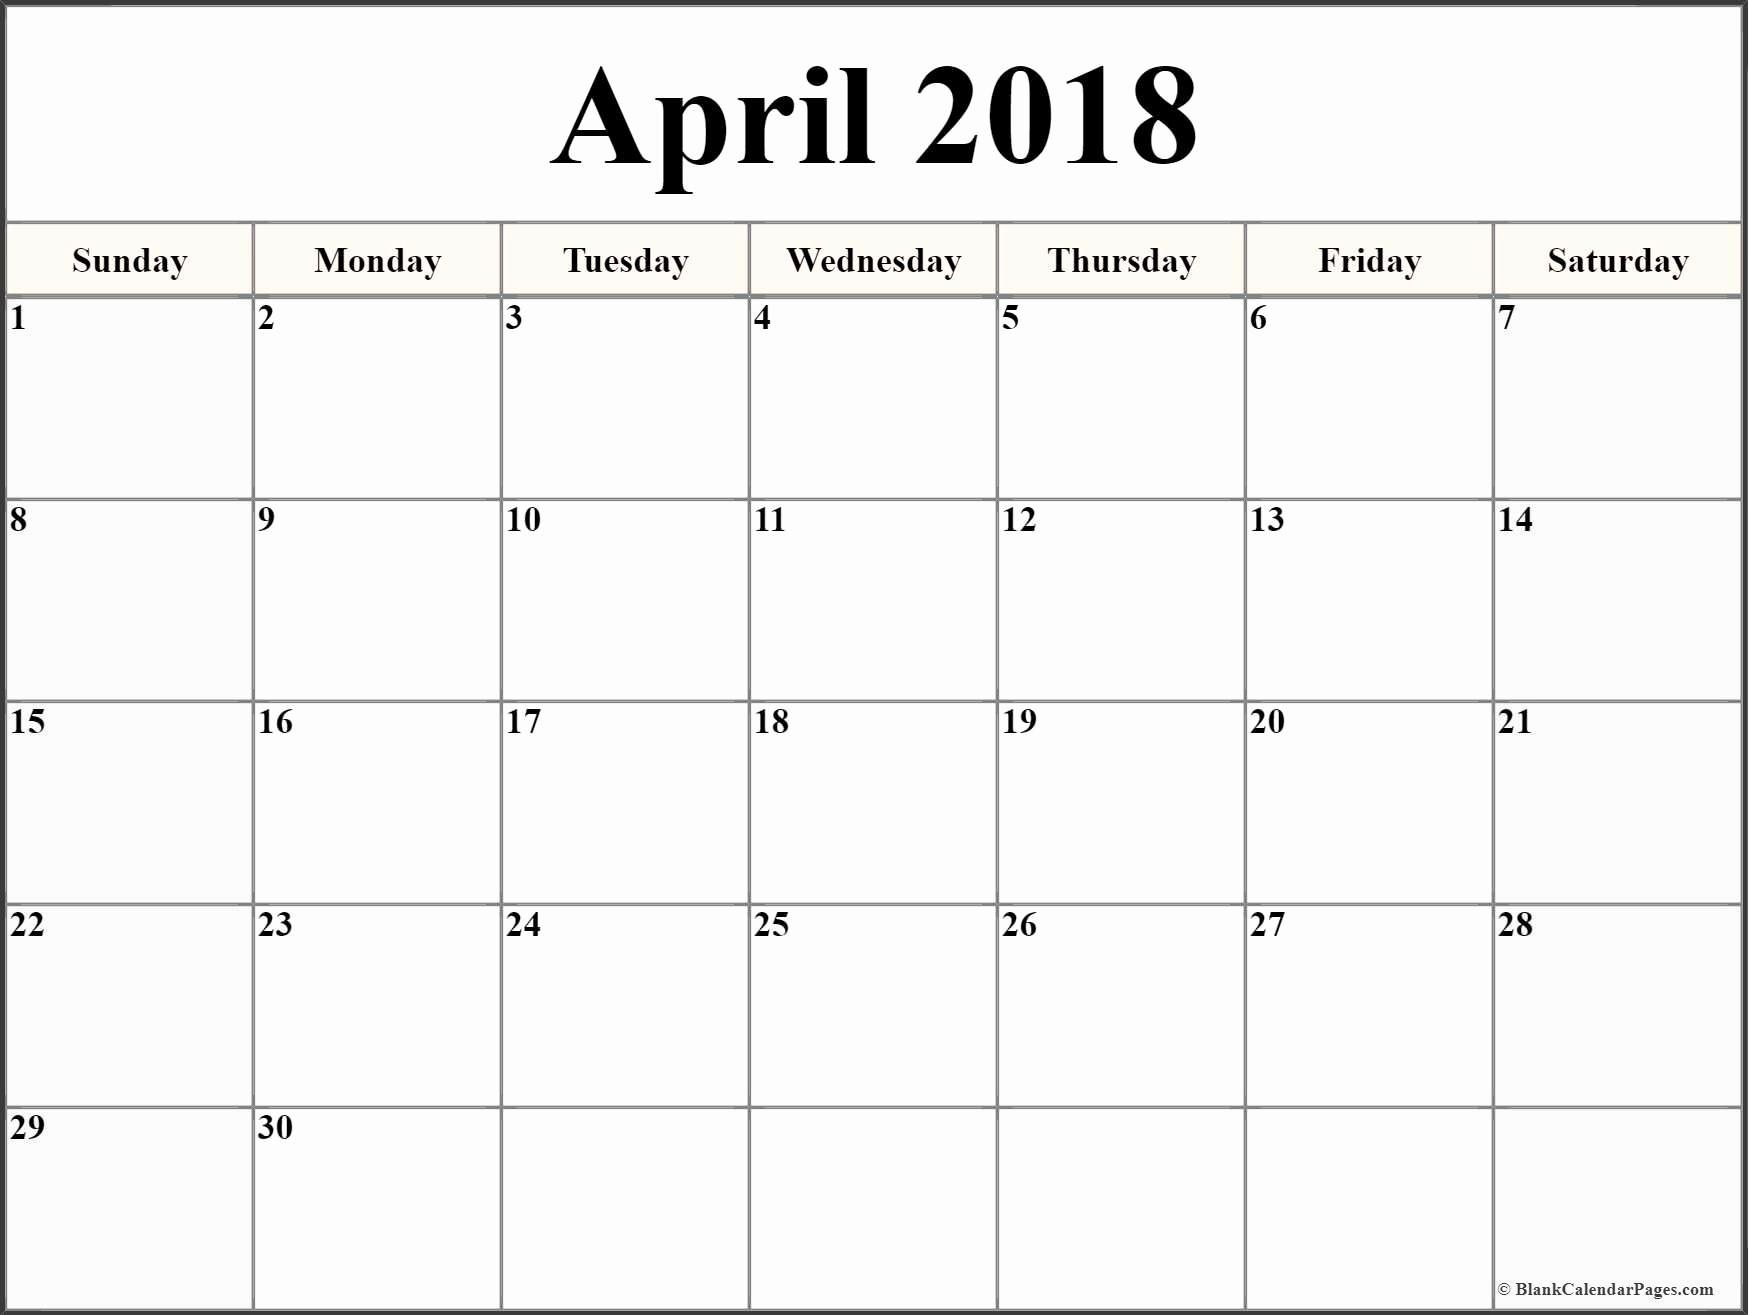 Blank April 2018 Calendar Template New April 2018 Blank Calendar Templates